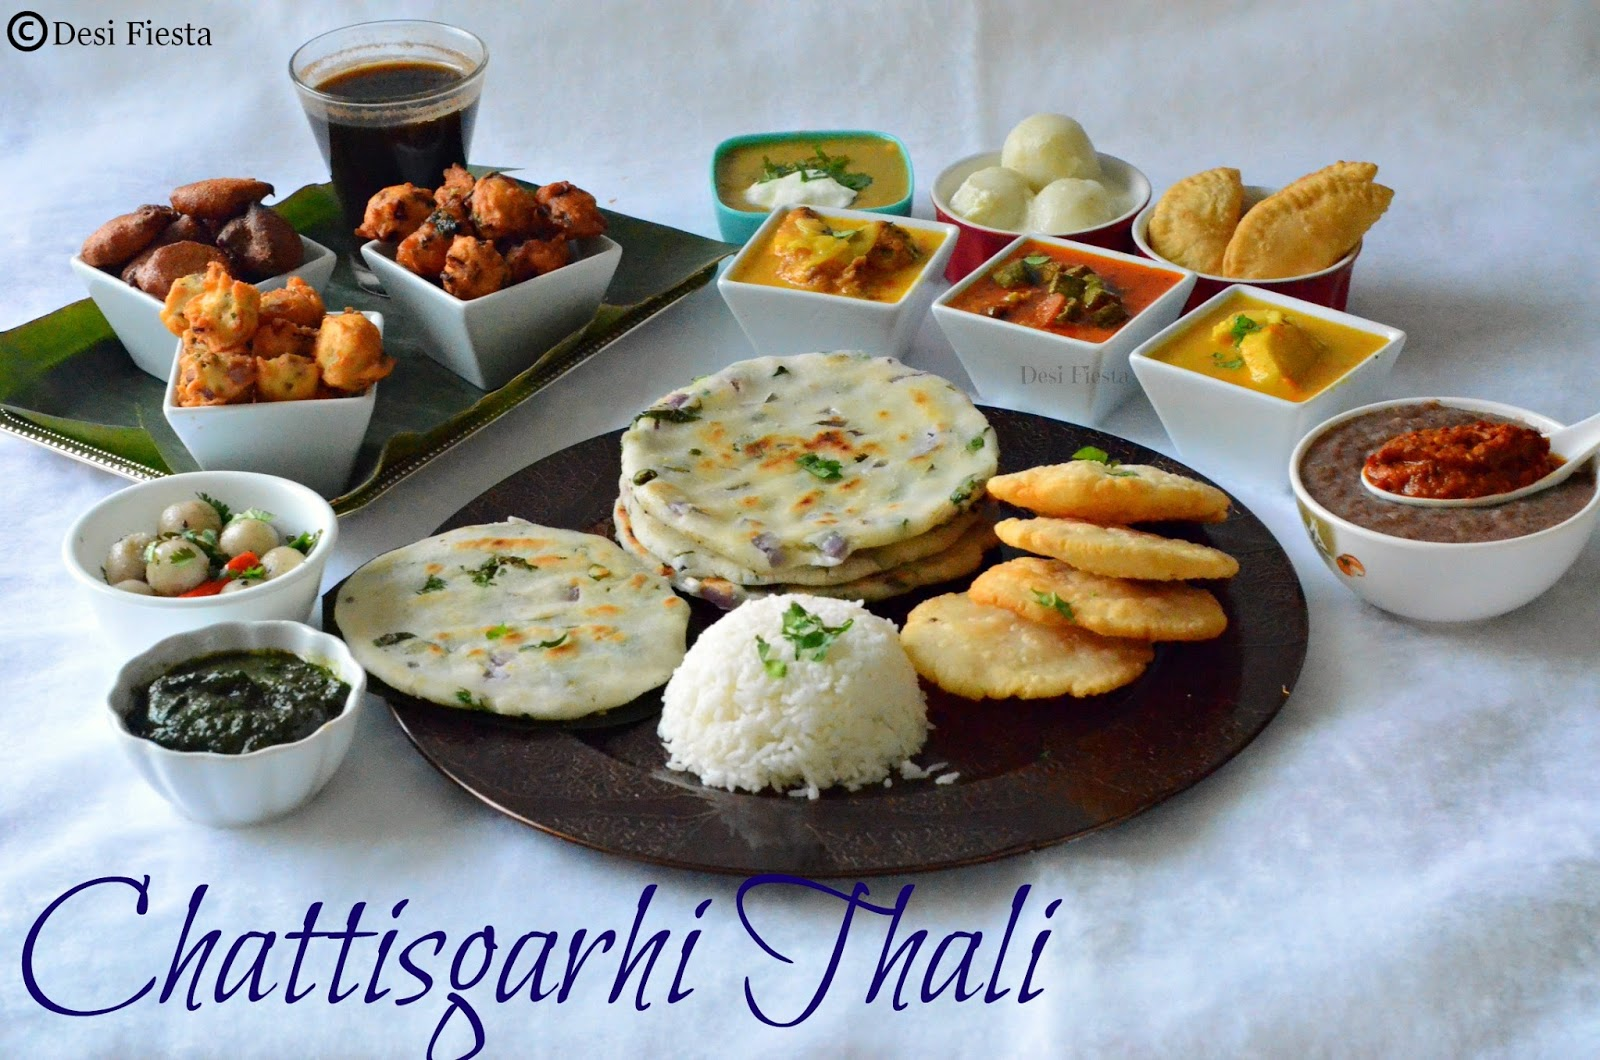 desi fiesta chattisgarhi thali chattisgarh cuisine. Black Bedroom Furniture Sets. Home Design Ideas